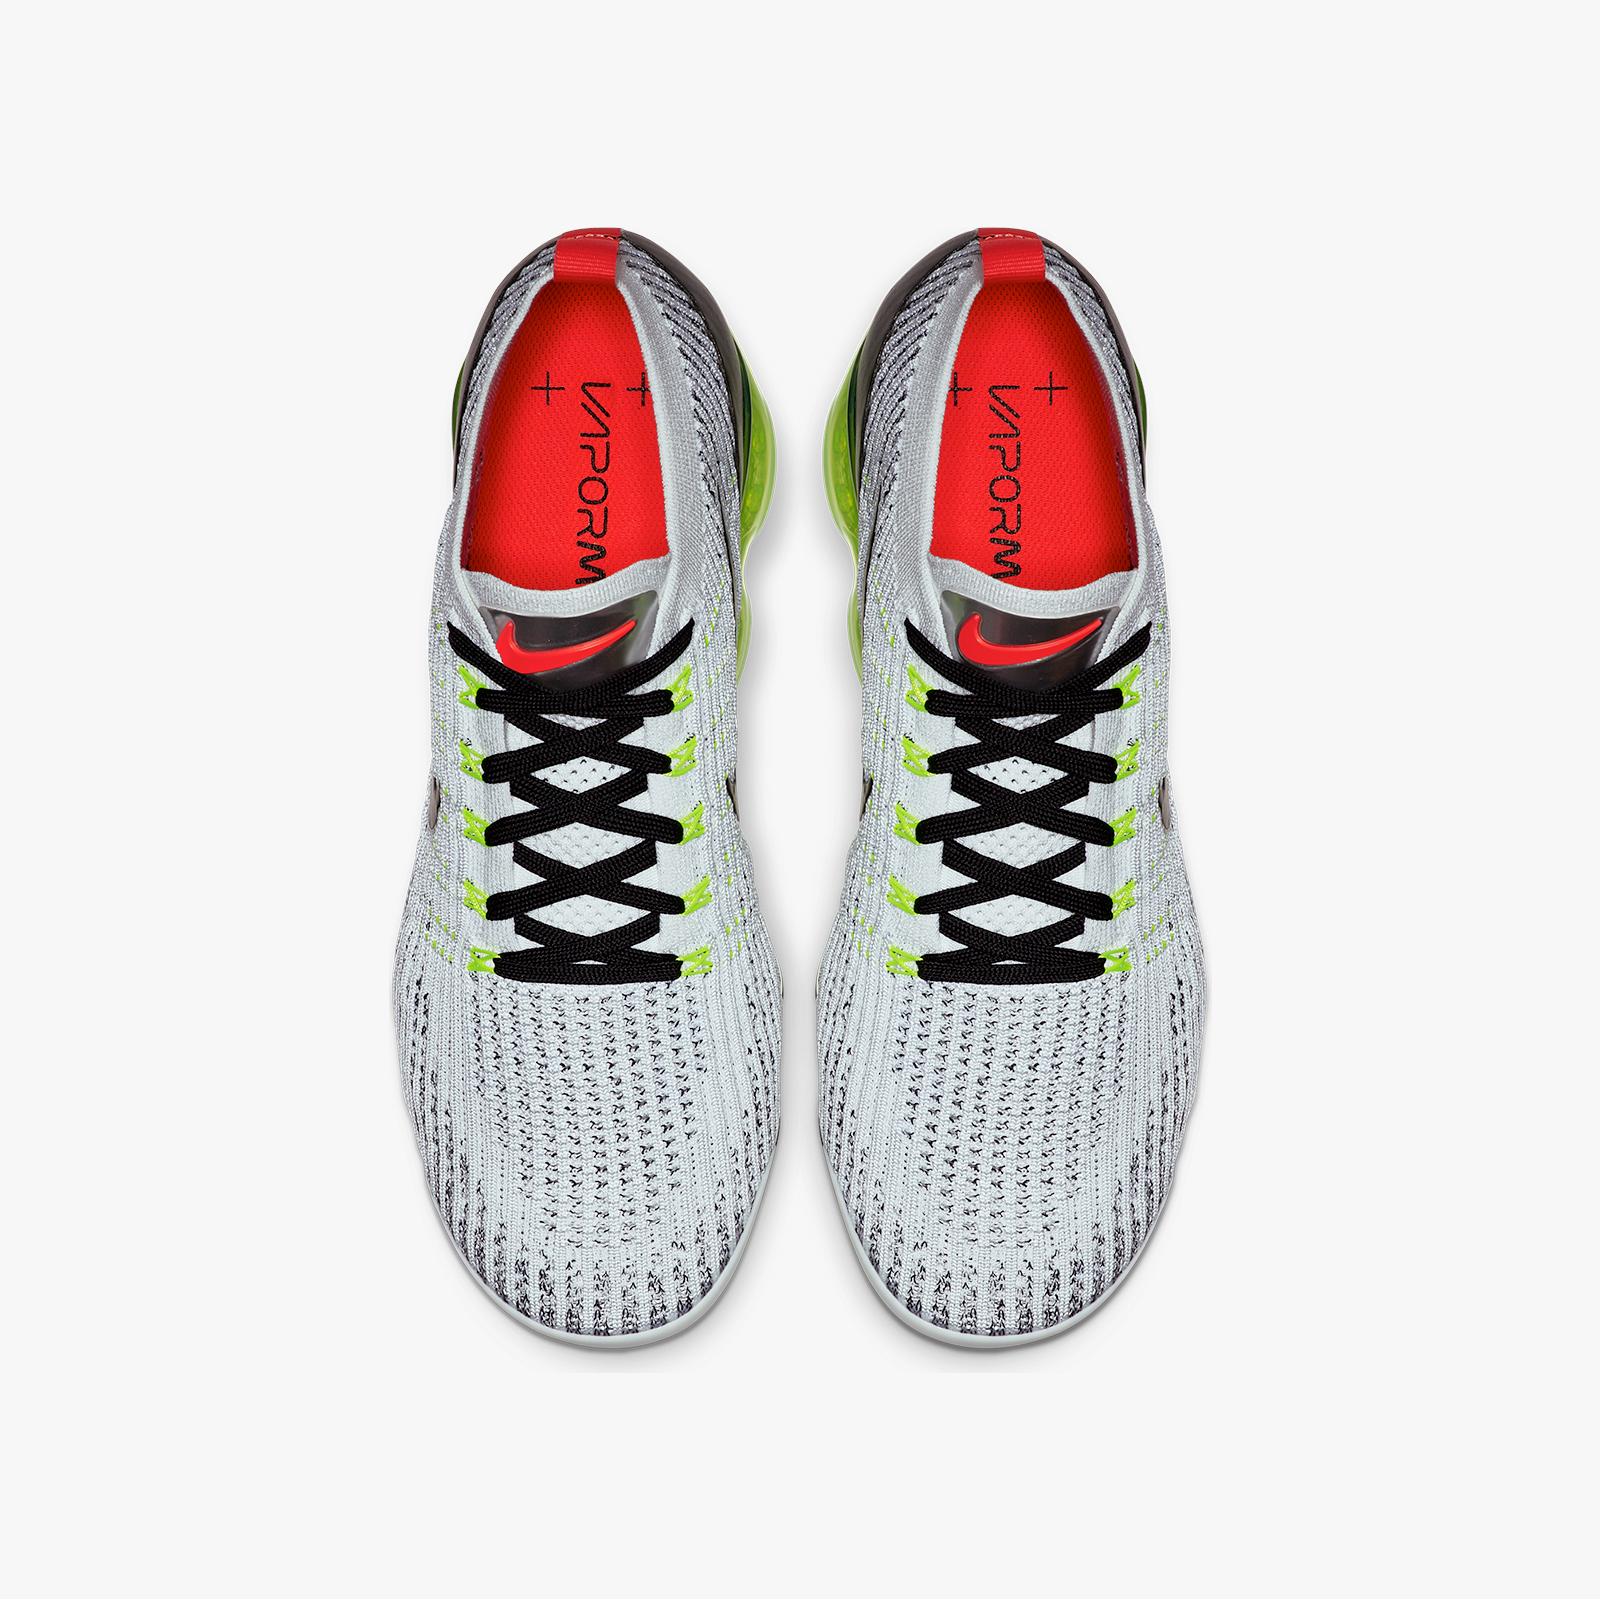 91fb22919f Nike Air Vapormax Flyknit 3. Style Code: Aj6900-100. Color: White/Black/Volt